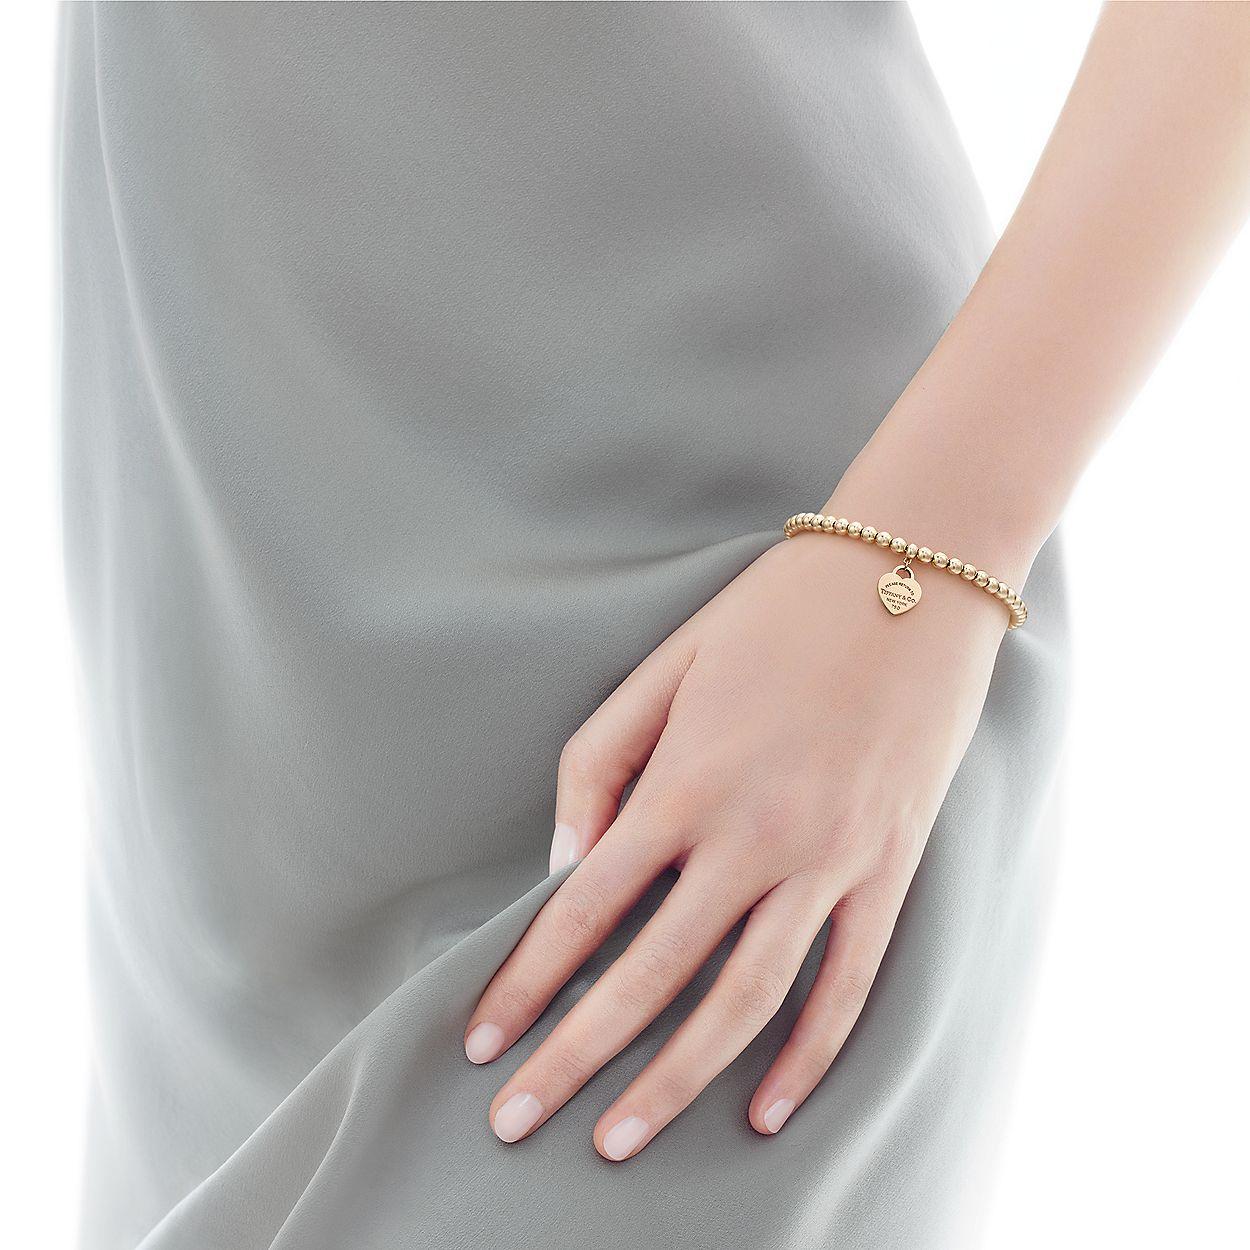 c0b2664728a Return to Tiffany® mini heart tag in 18k gold on a bead bracelet ...